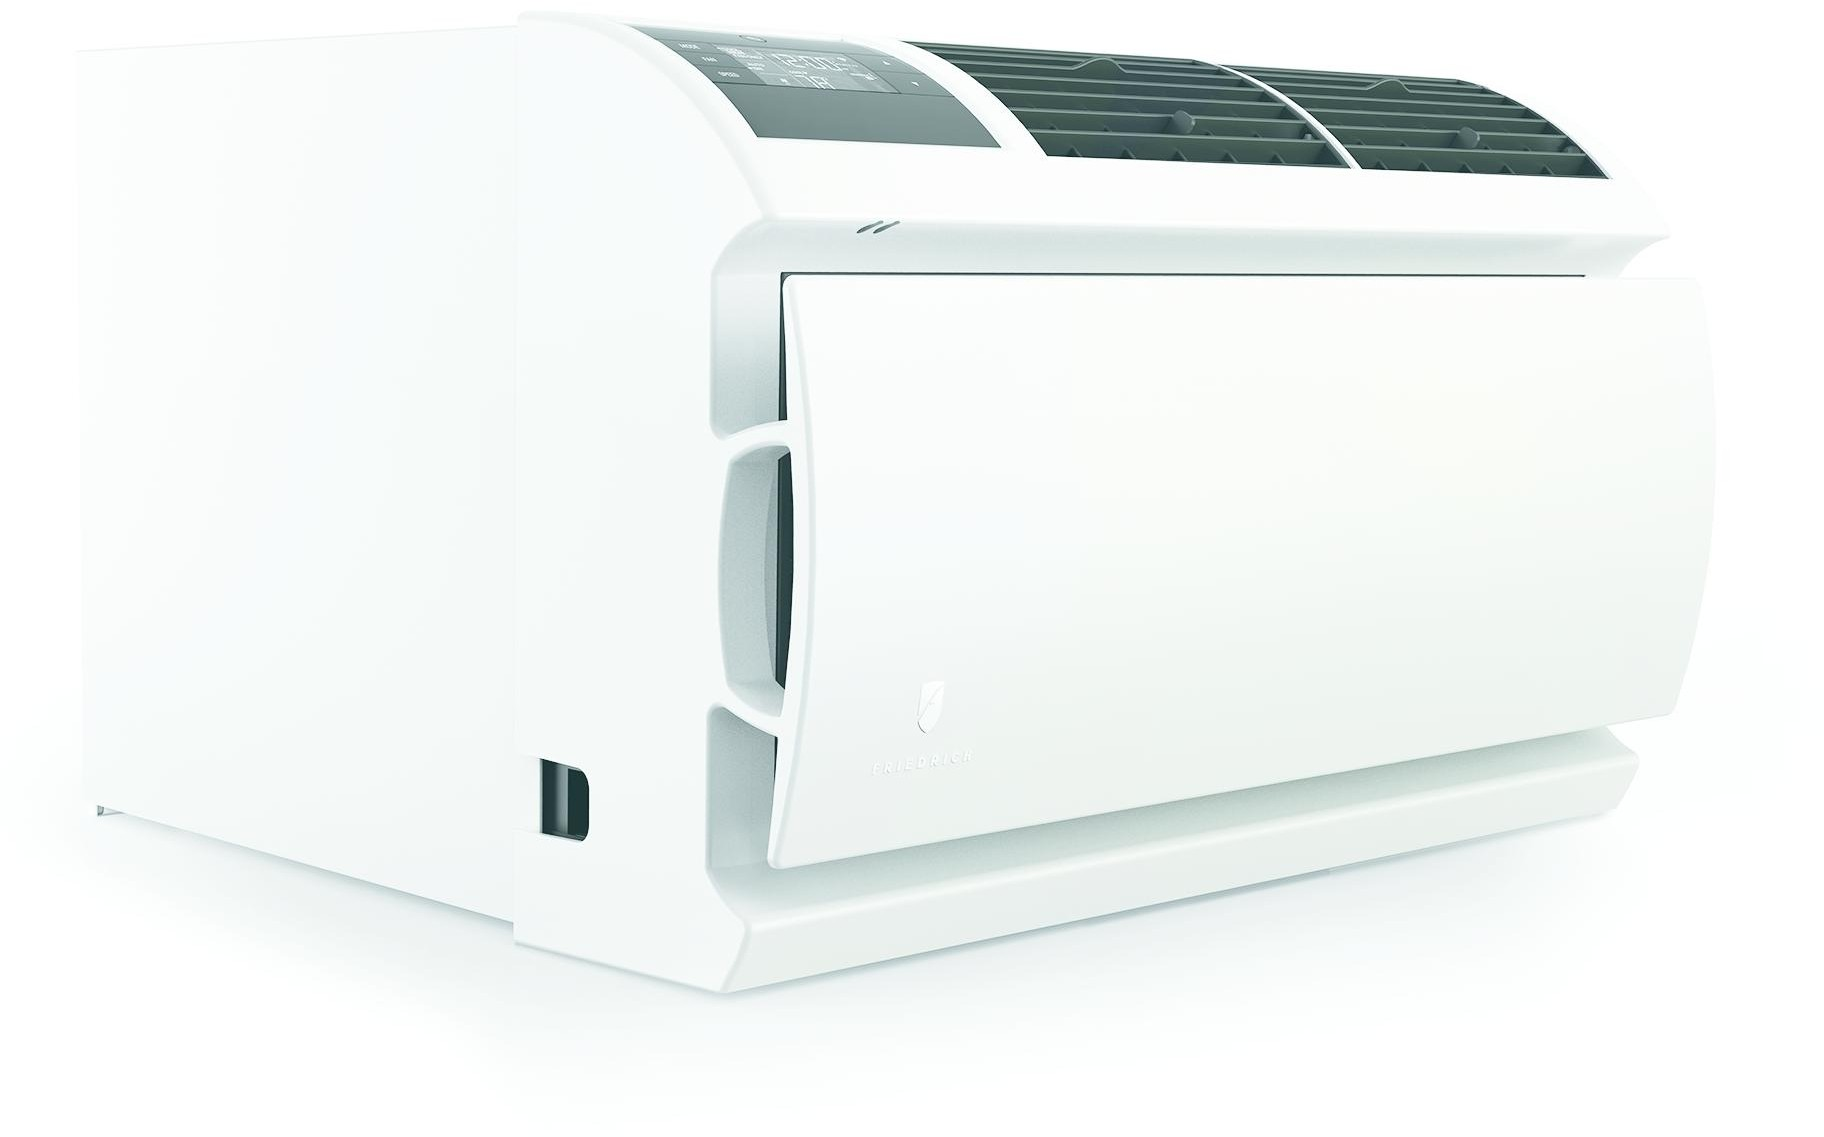 Friedrich WallMaster 11,100 BTU Wall Air Conditioner WHT12A33A